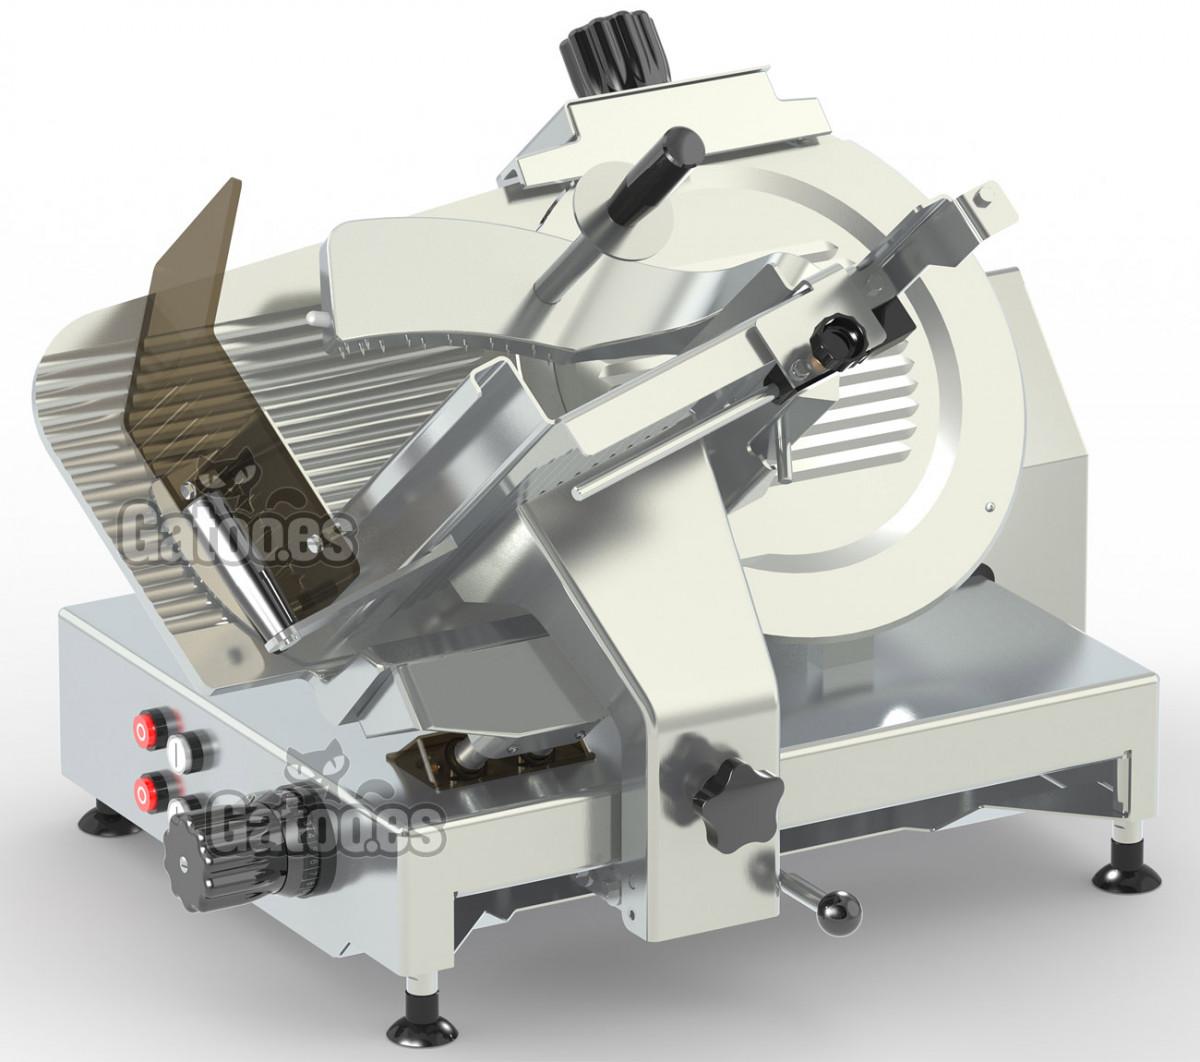 Cortafiambres Profesional BRAHER MA-350 de 350 mm. Automática